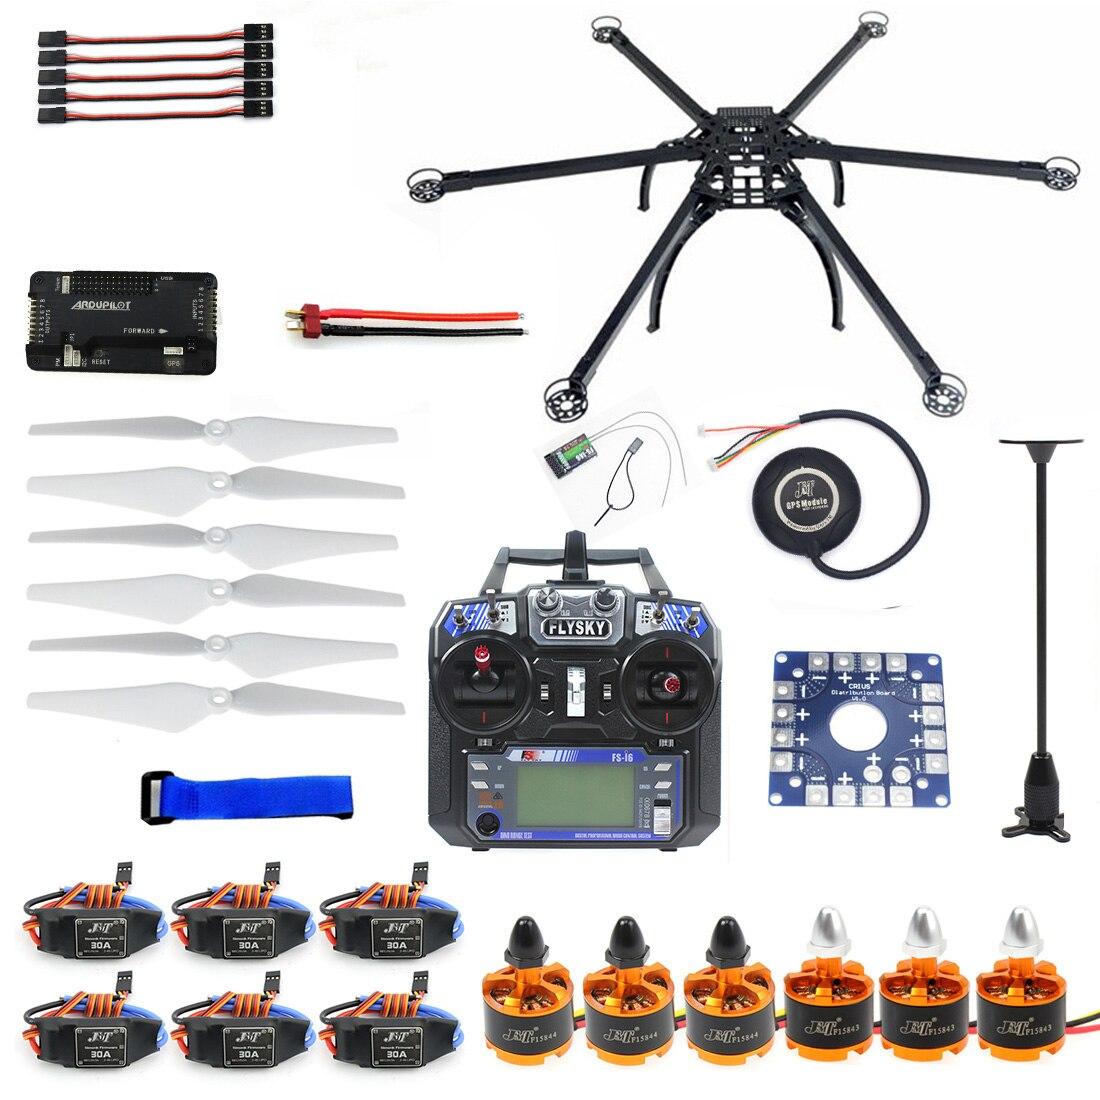 Шестиосные Hexacopter в разобранном виде gps Drone Kit с Flysky FS-i6 6CH 2,4 г TX и RX APM 2,8 Multicopter полет контроллер F10513-F